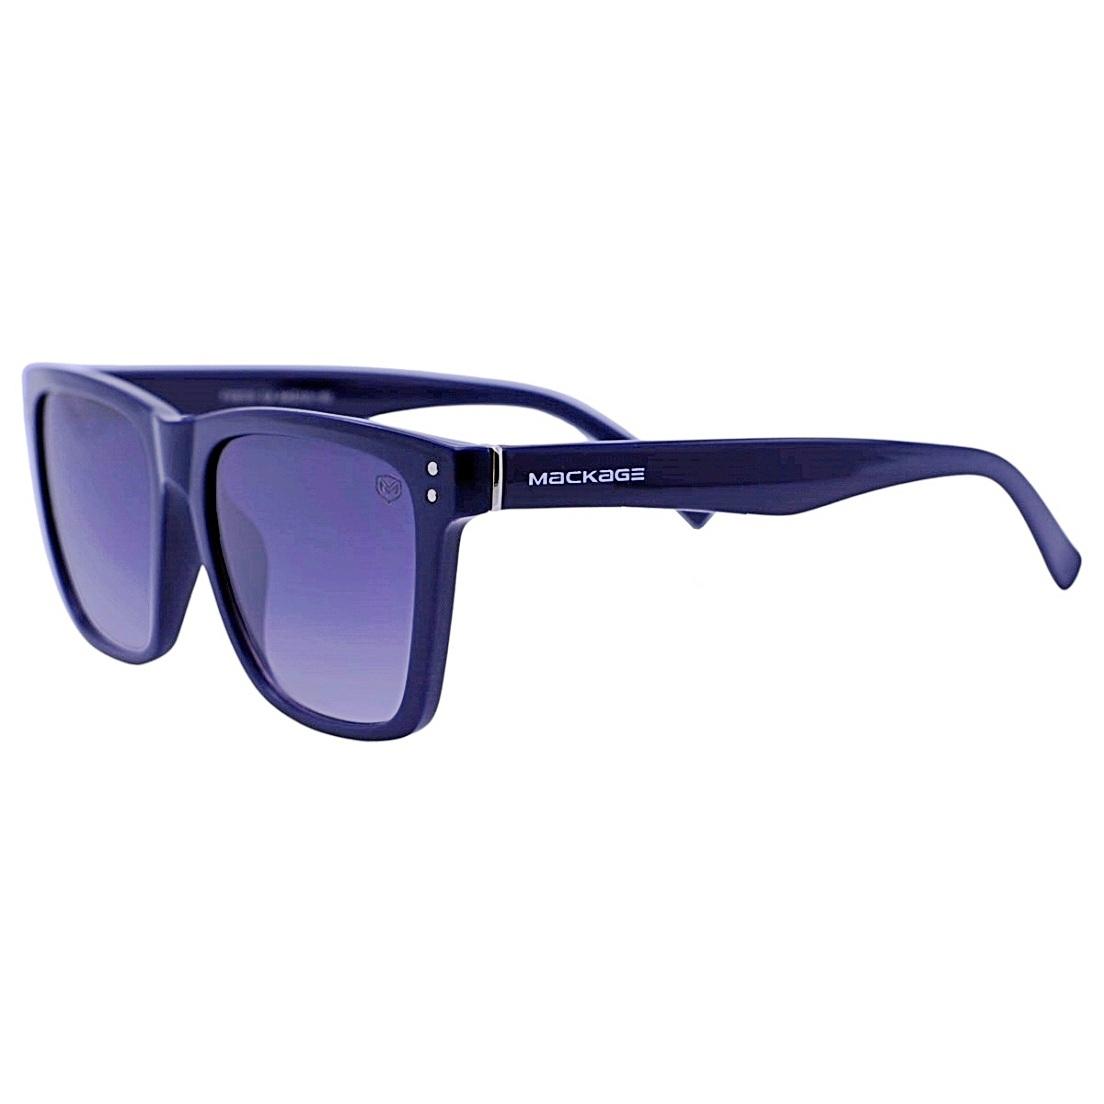 Óculos De Sol Mackage Unissex Esportivo Acetato Retangular - Azul